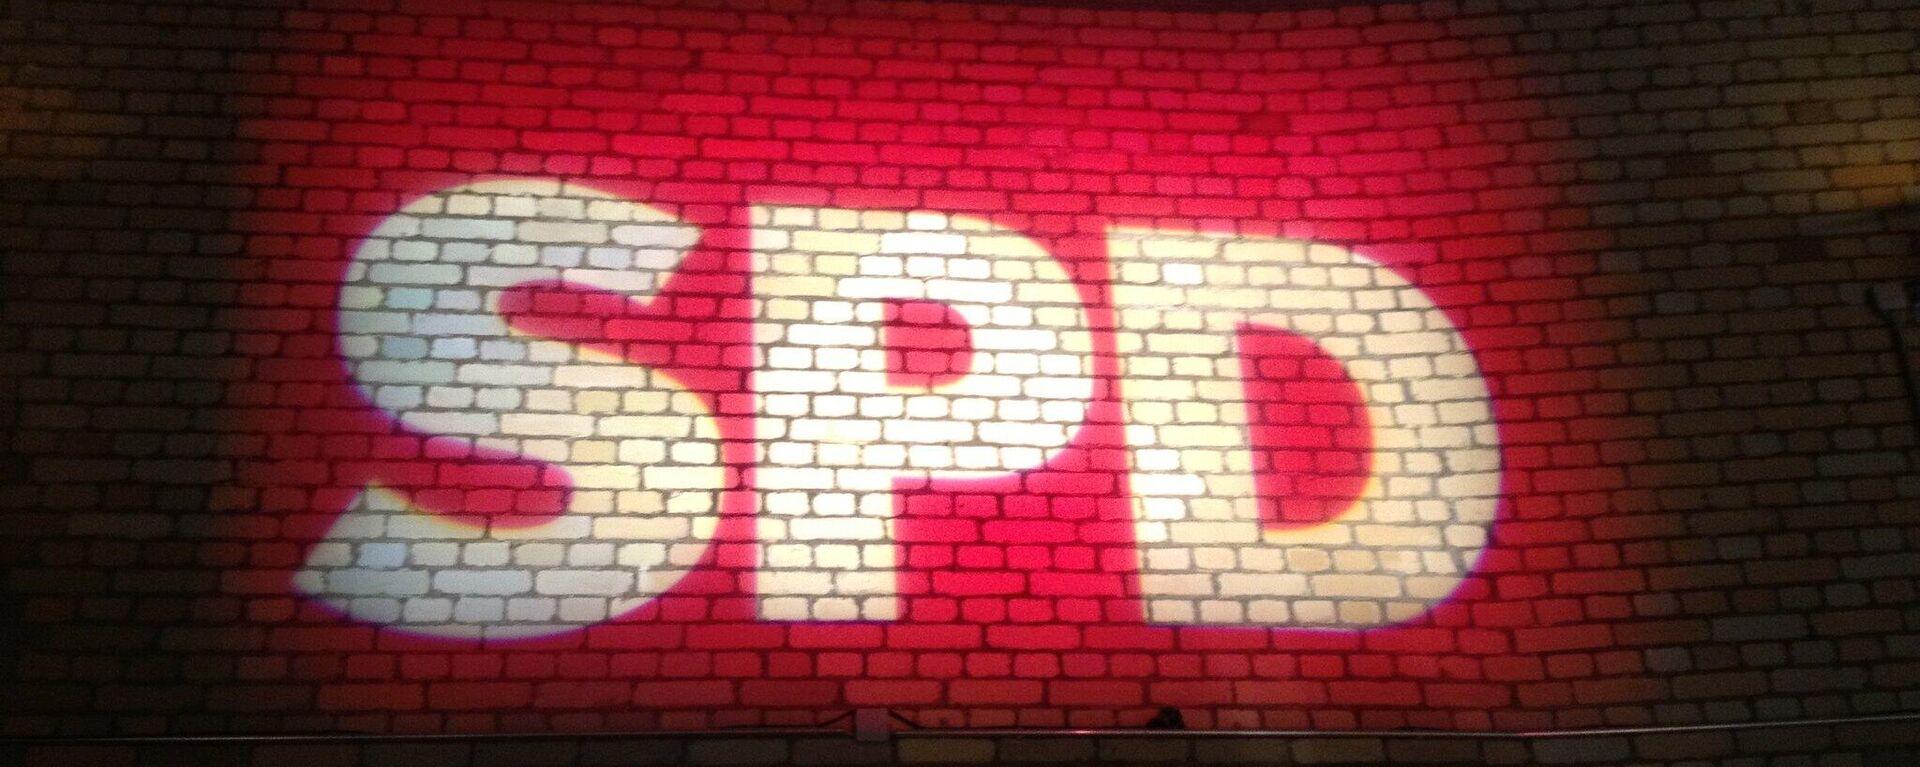 SPD Logo - SNA, 1920, 04.09.2021